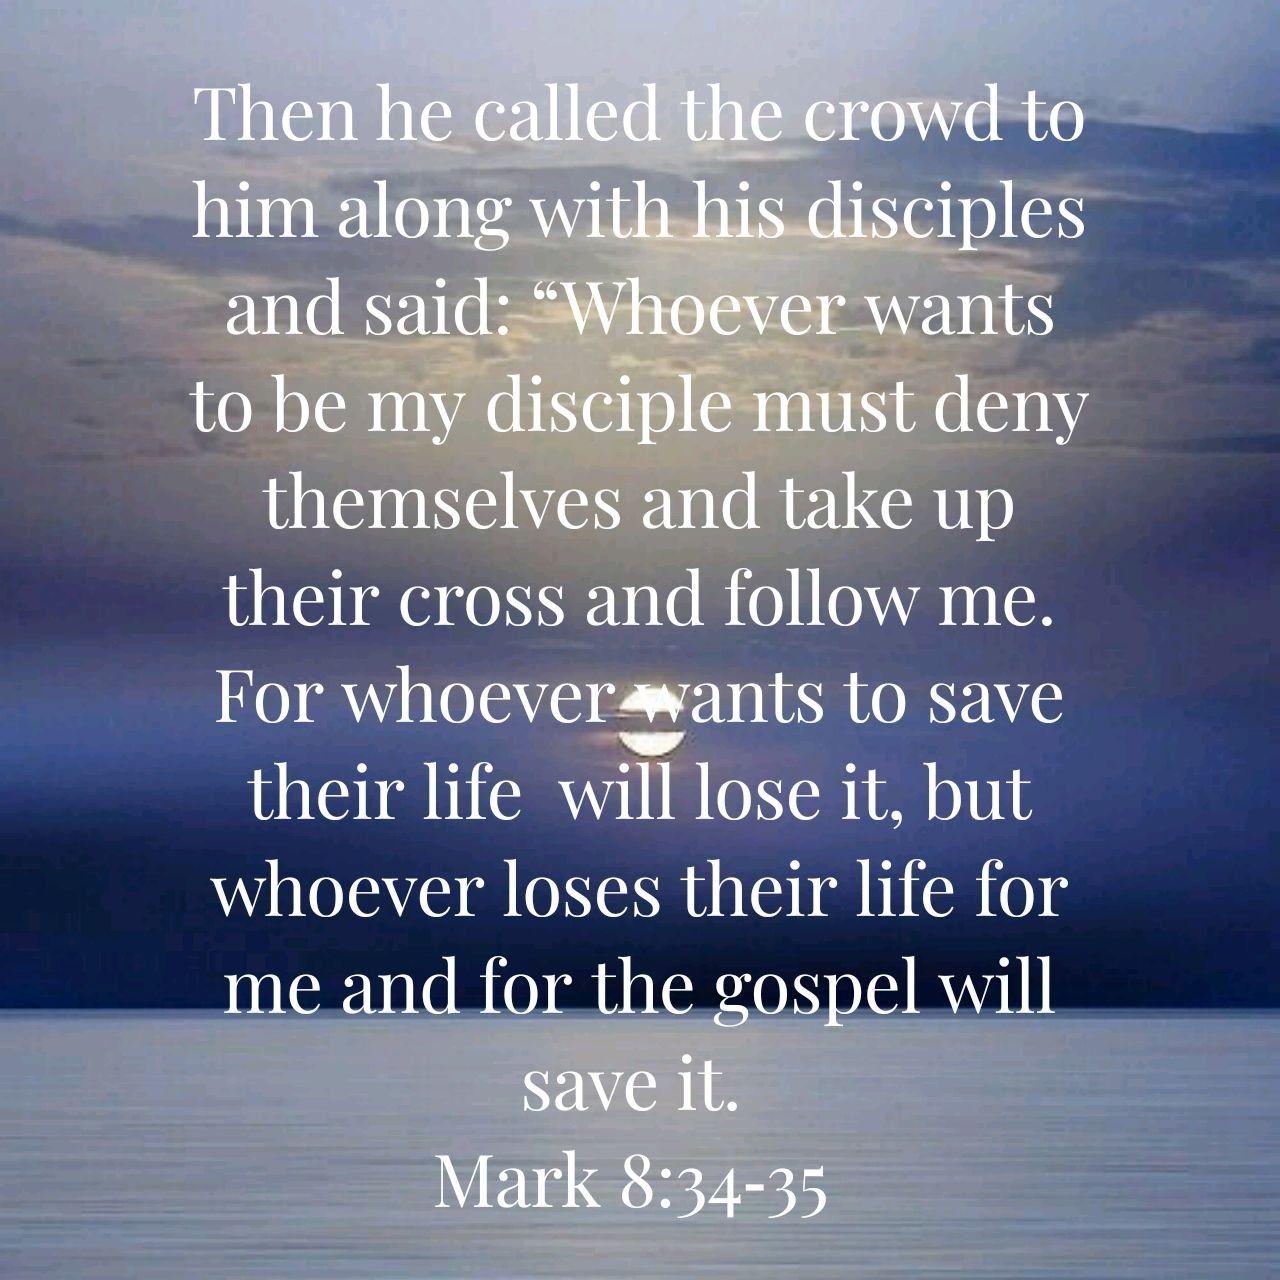 Pin by Maggie Mcmasters on Gospels Matthew, Mark,Luke,John | God